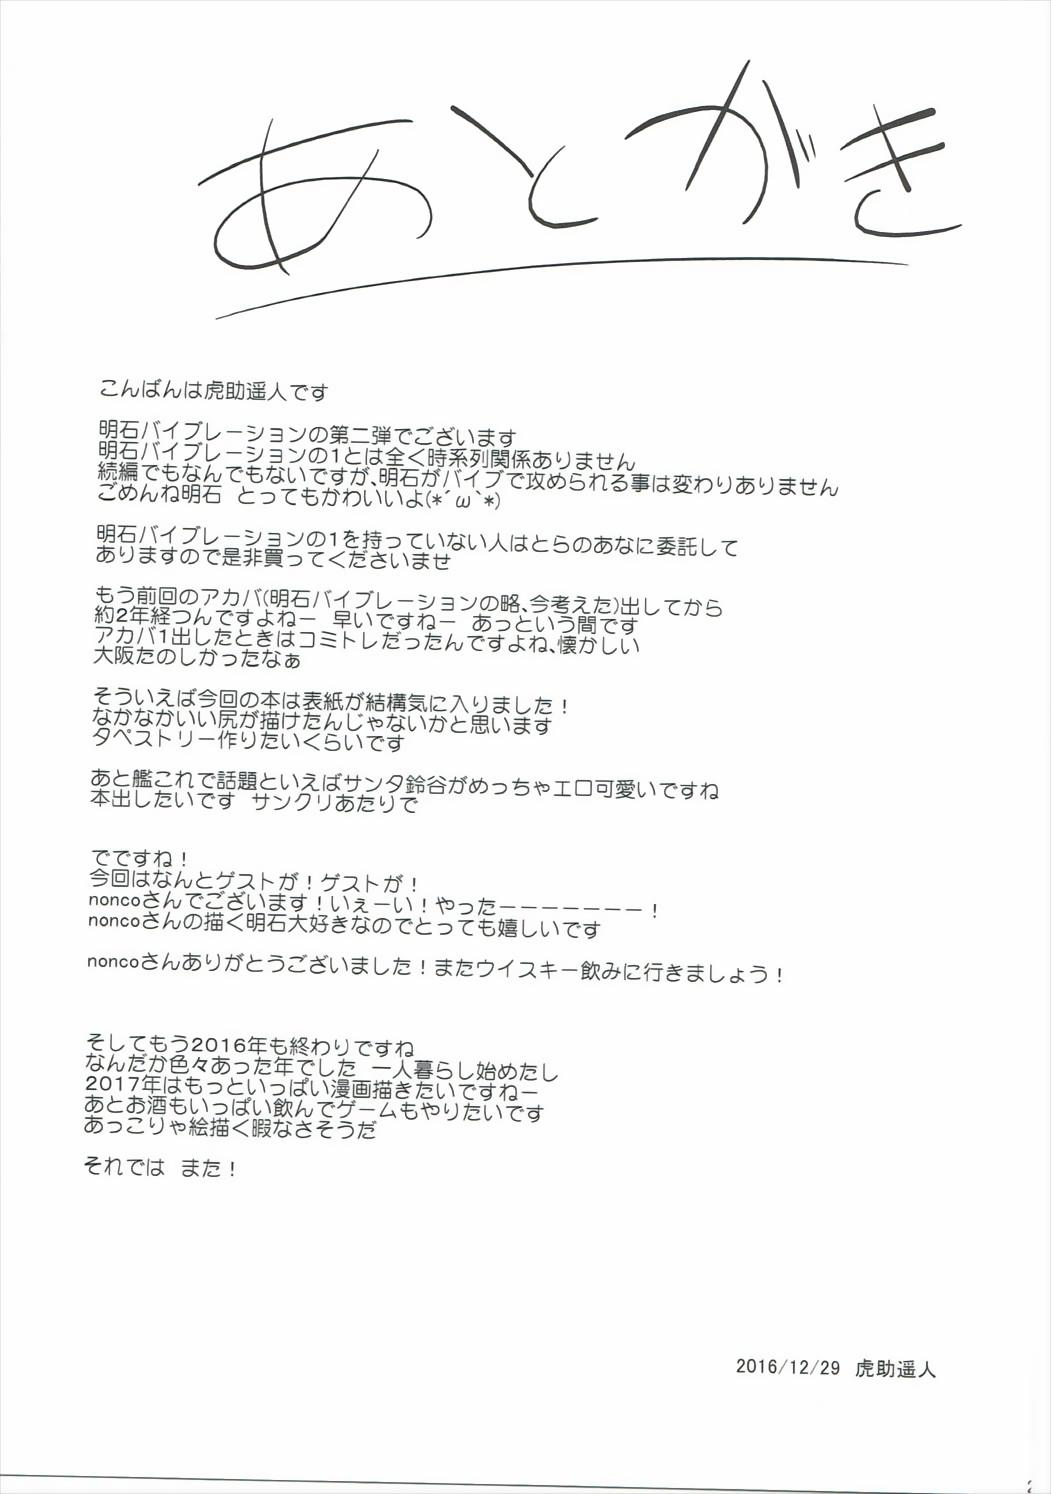 Akashi Vibration 2 25